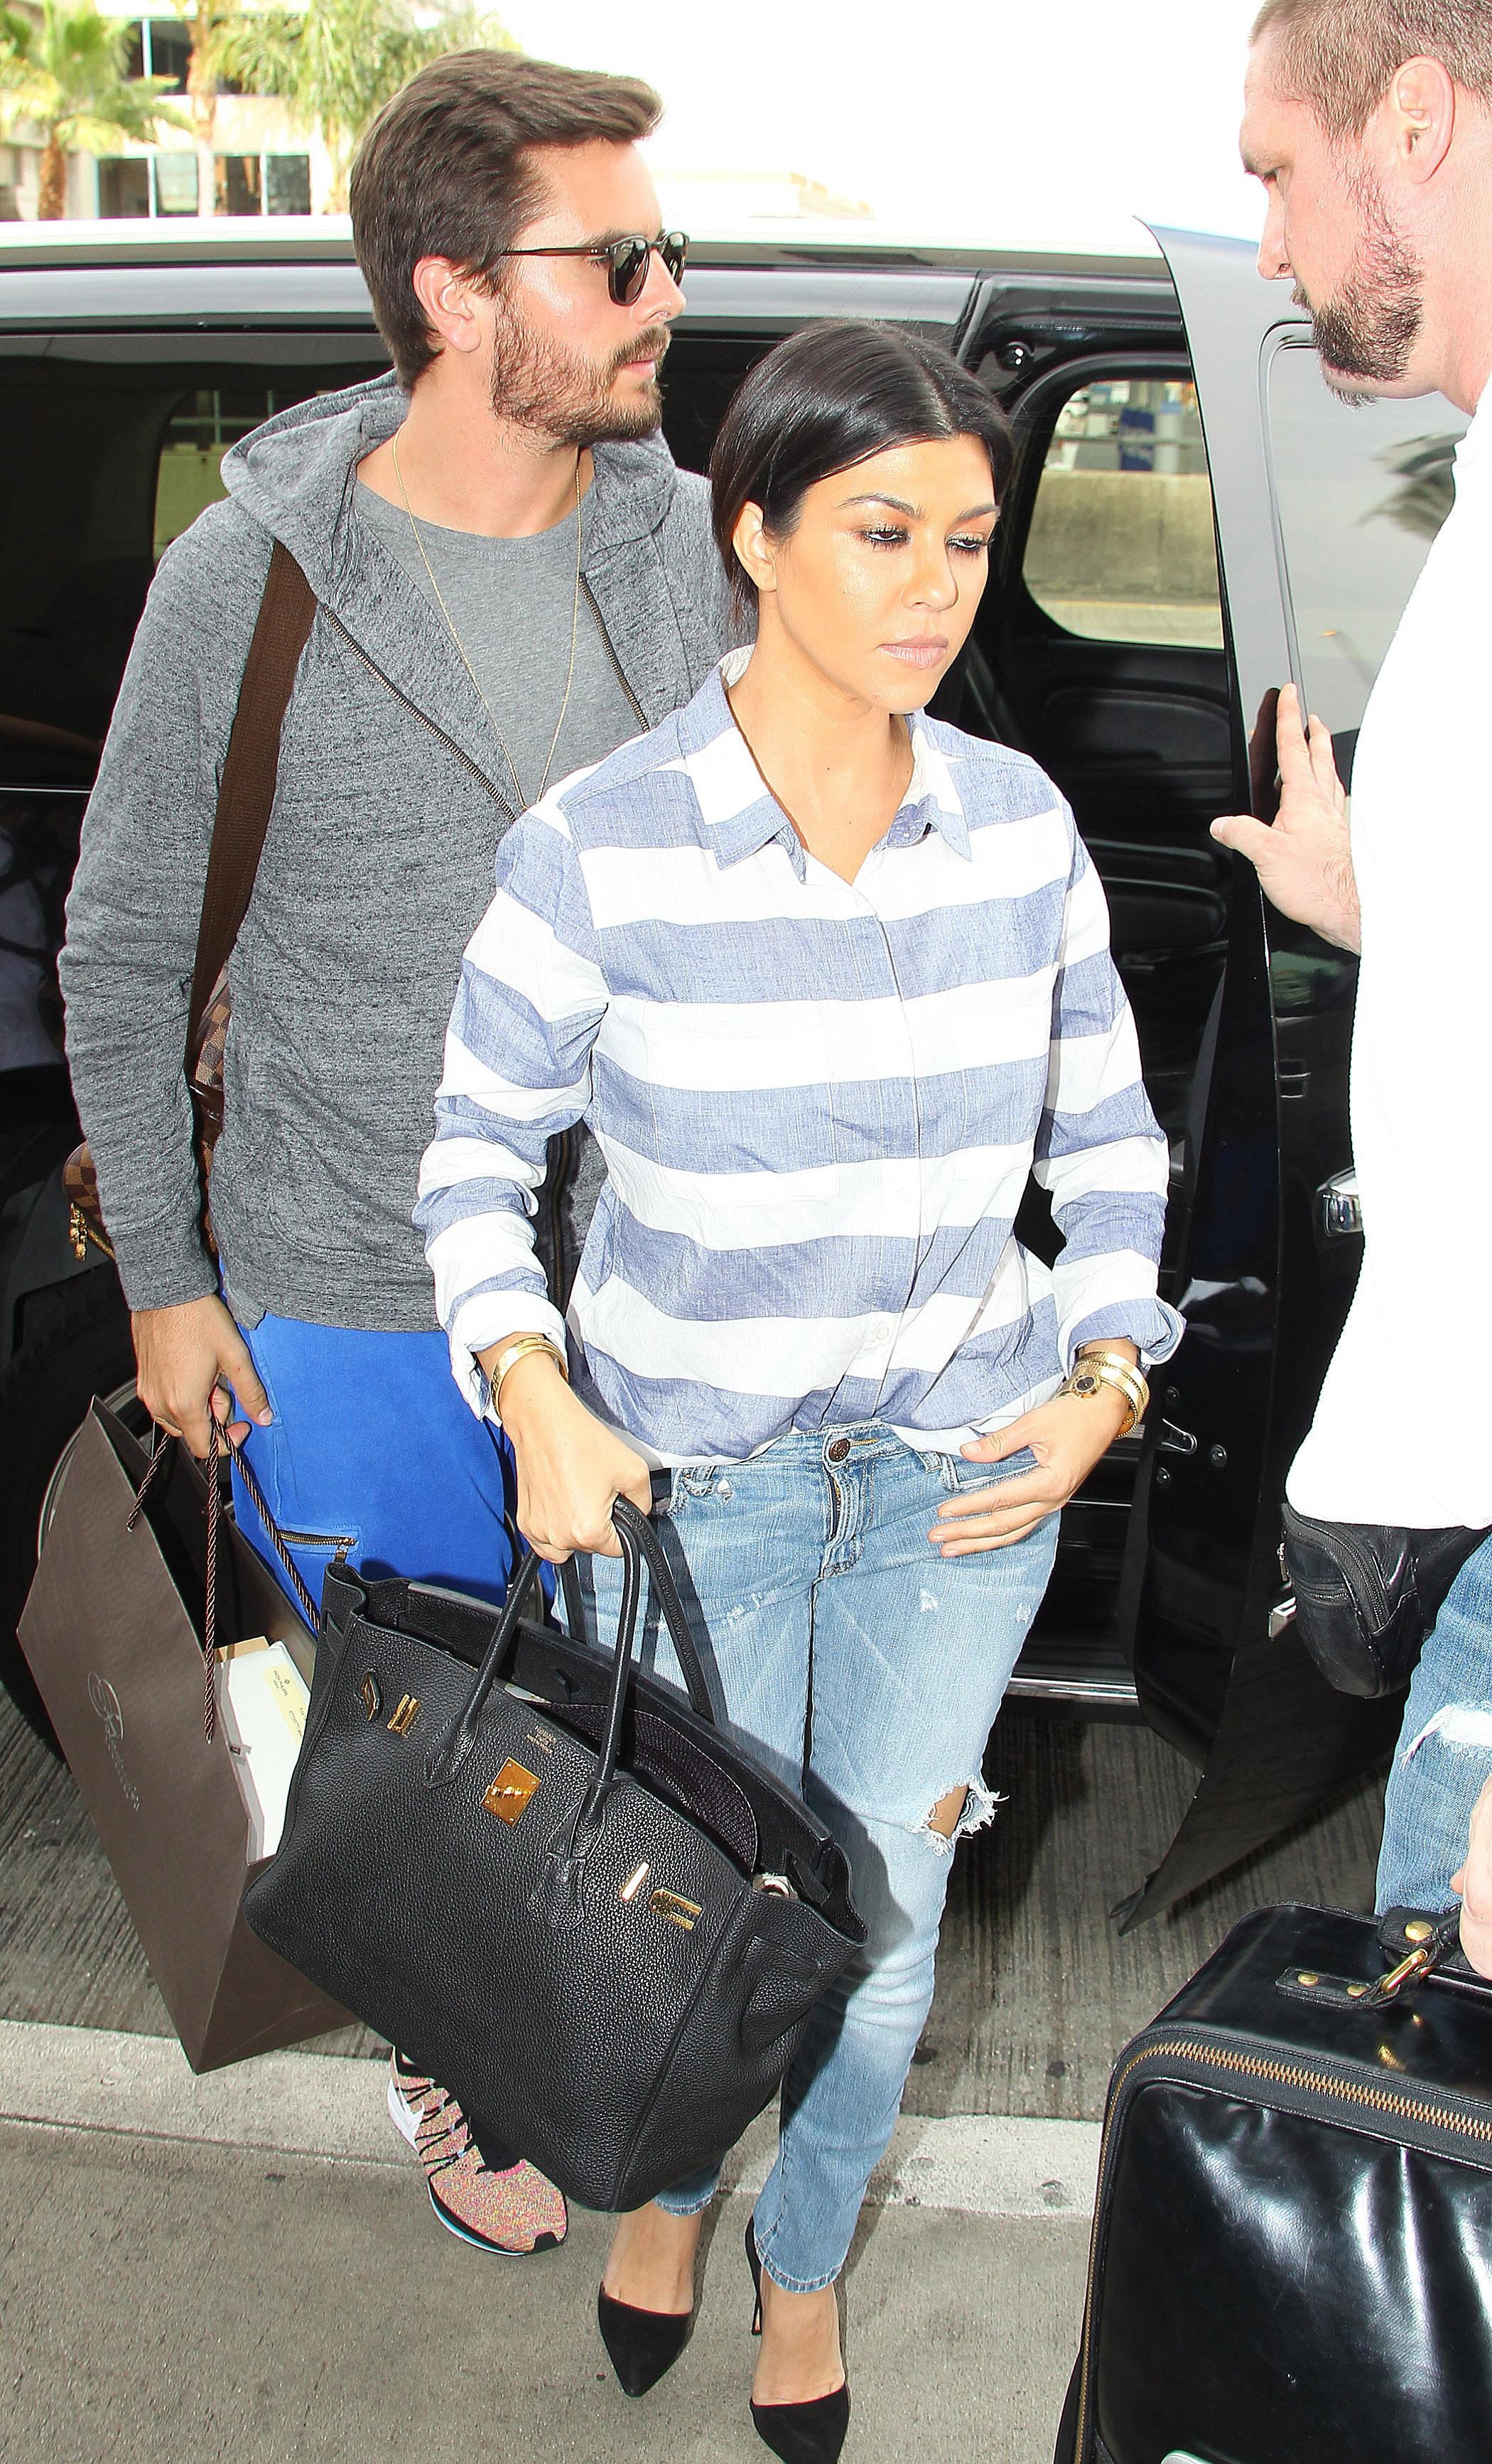 Kim Kardashian, Kourtney Kardashian and Khloe Kardashian arrive at LAX Airport